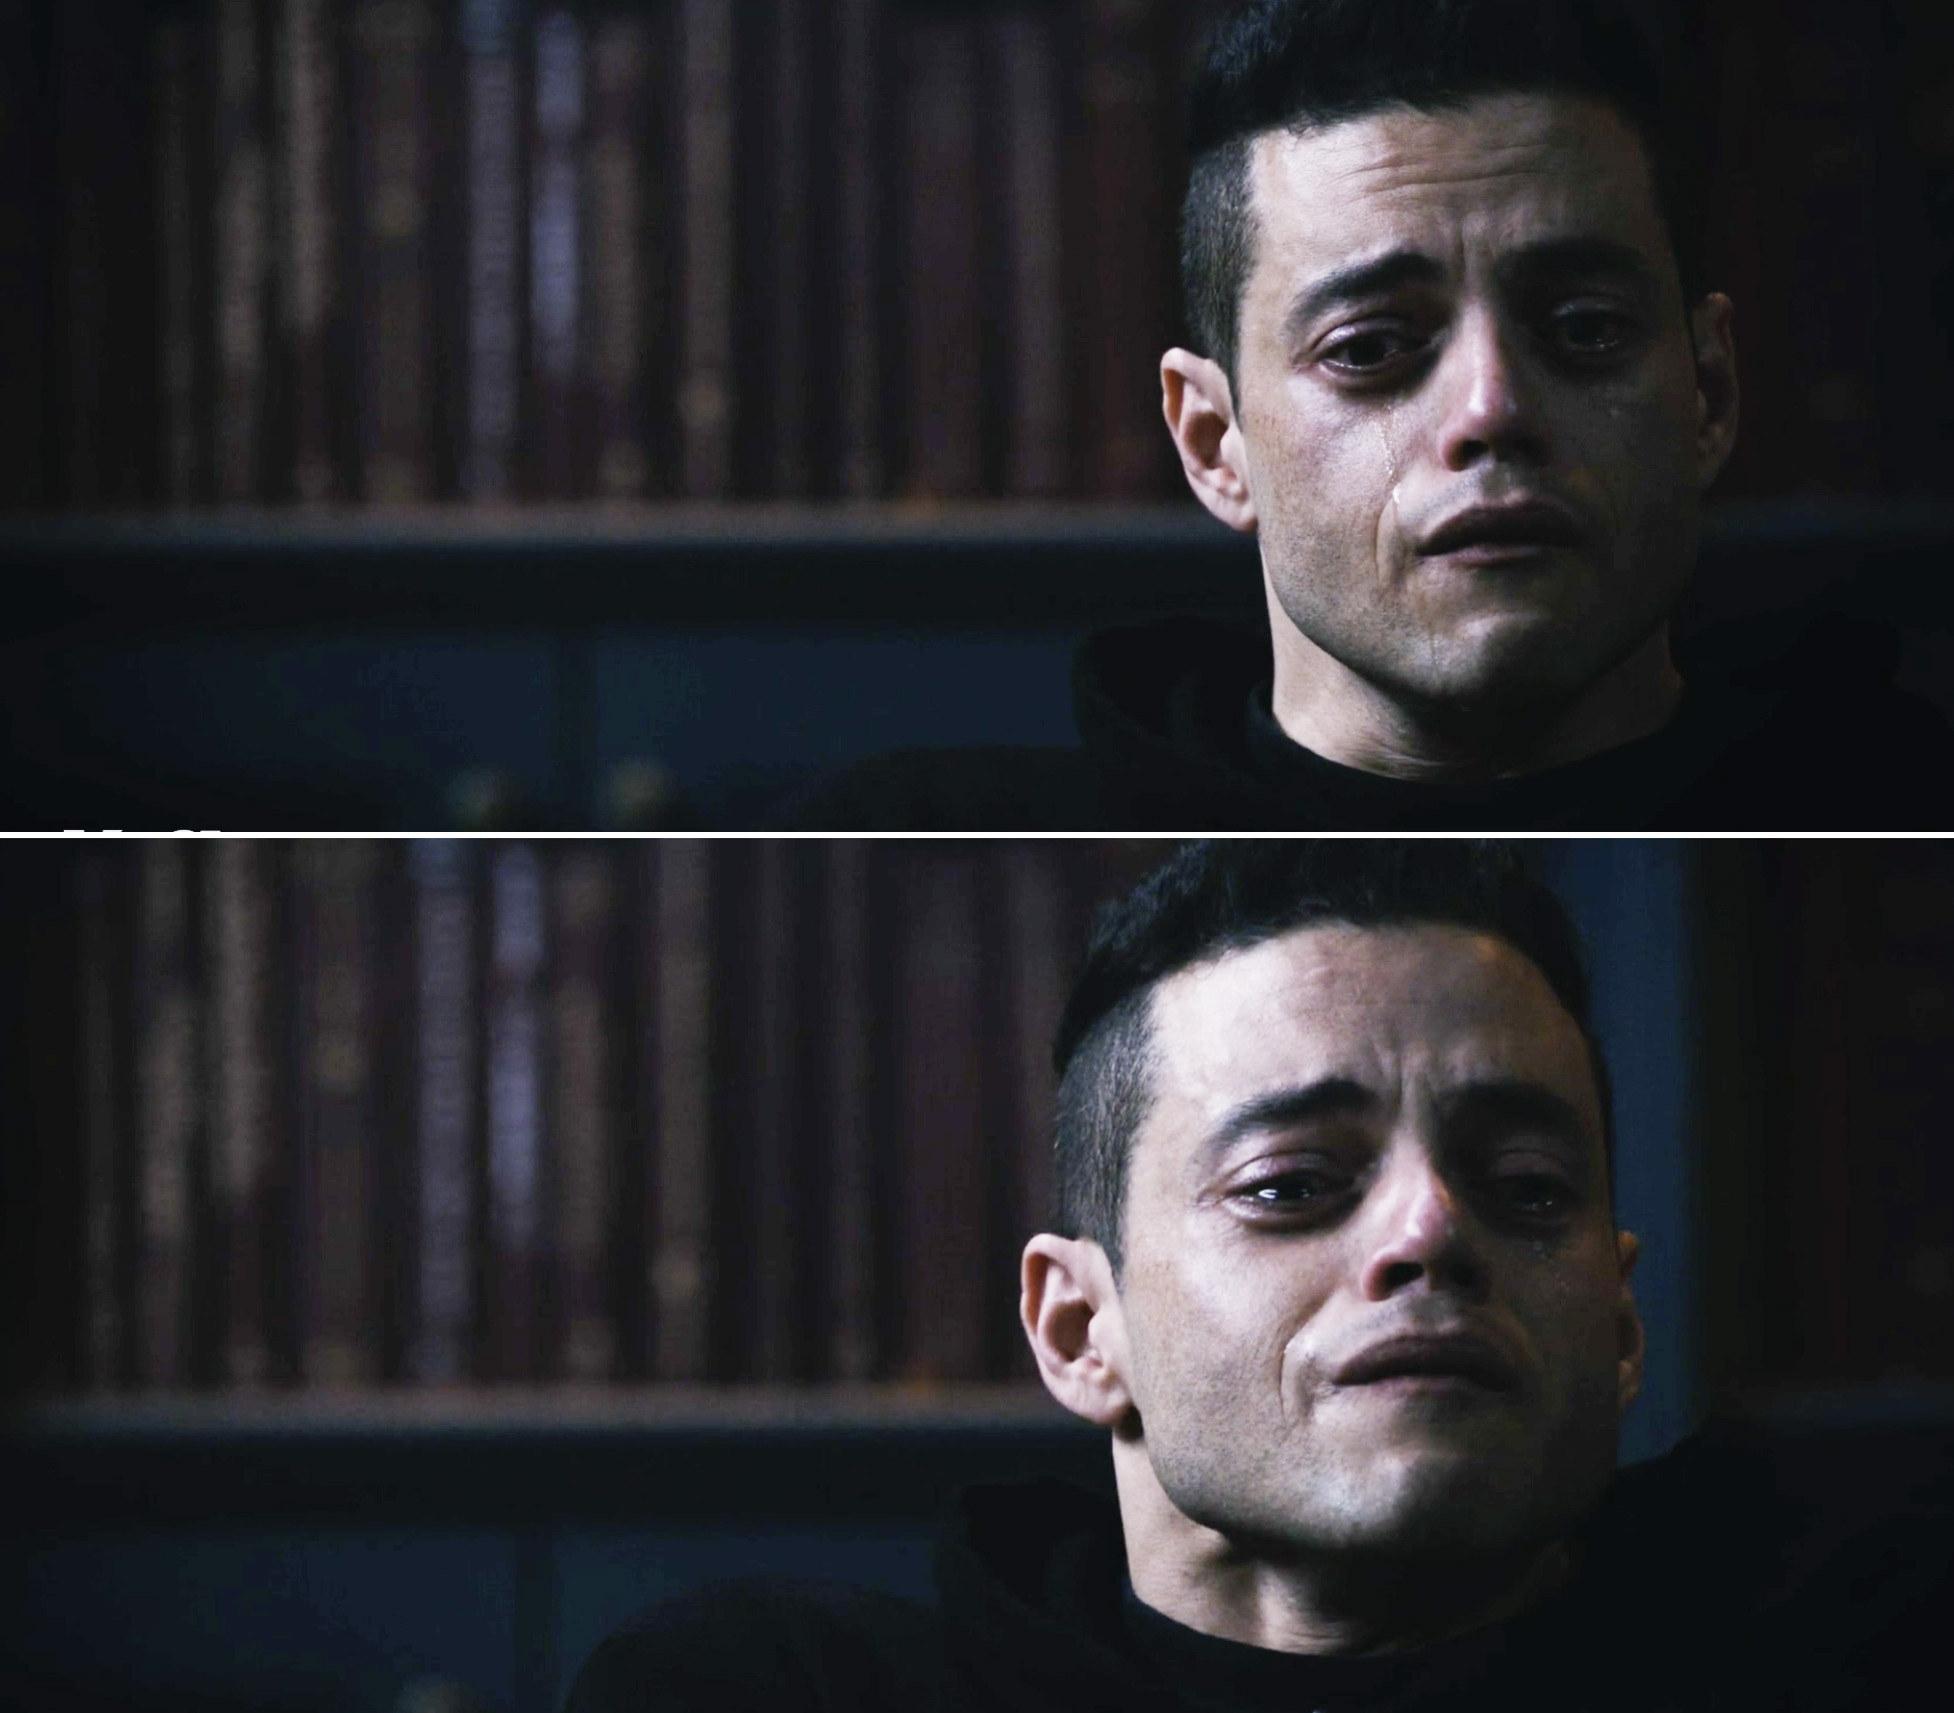 Elliot sobbing